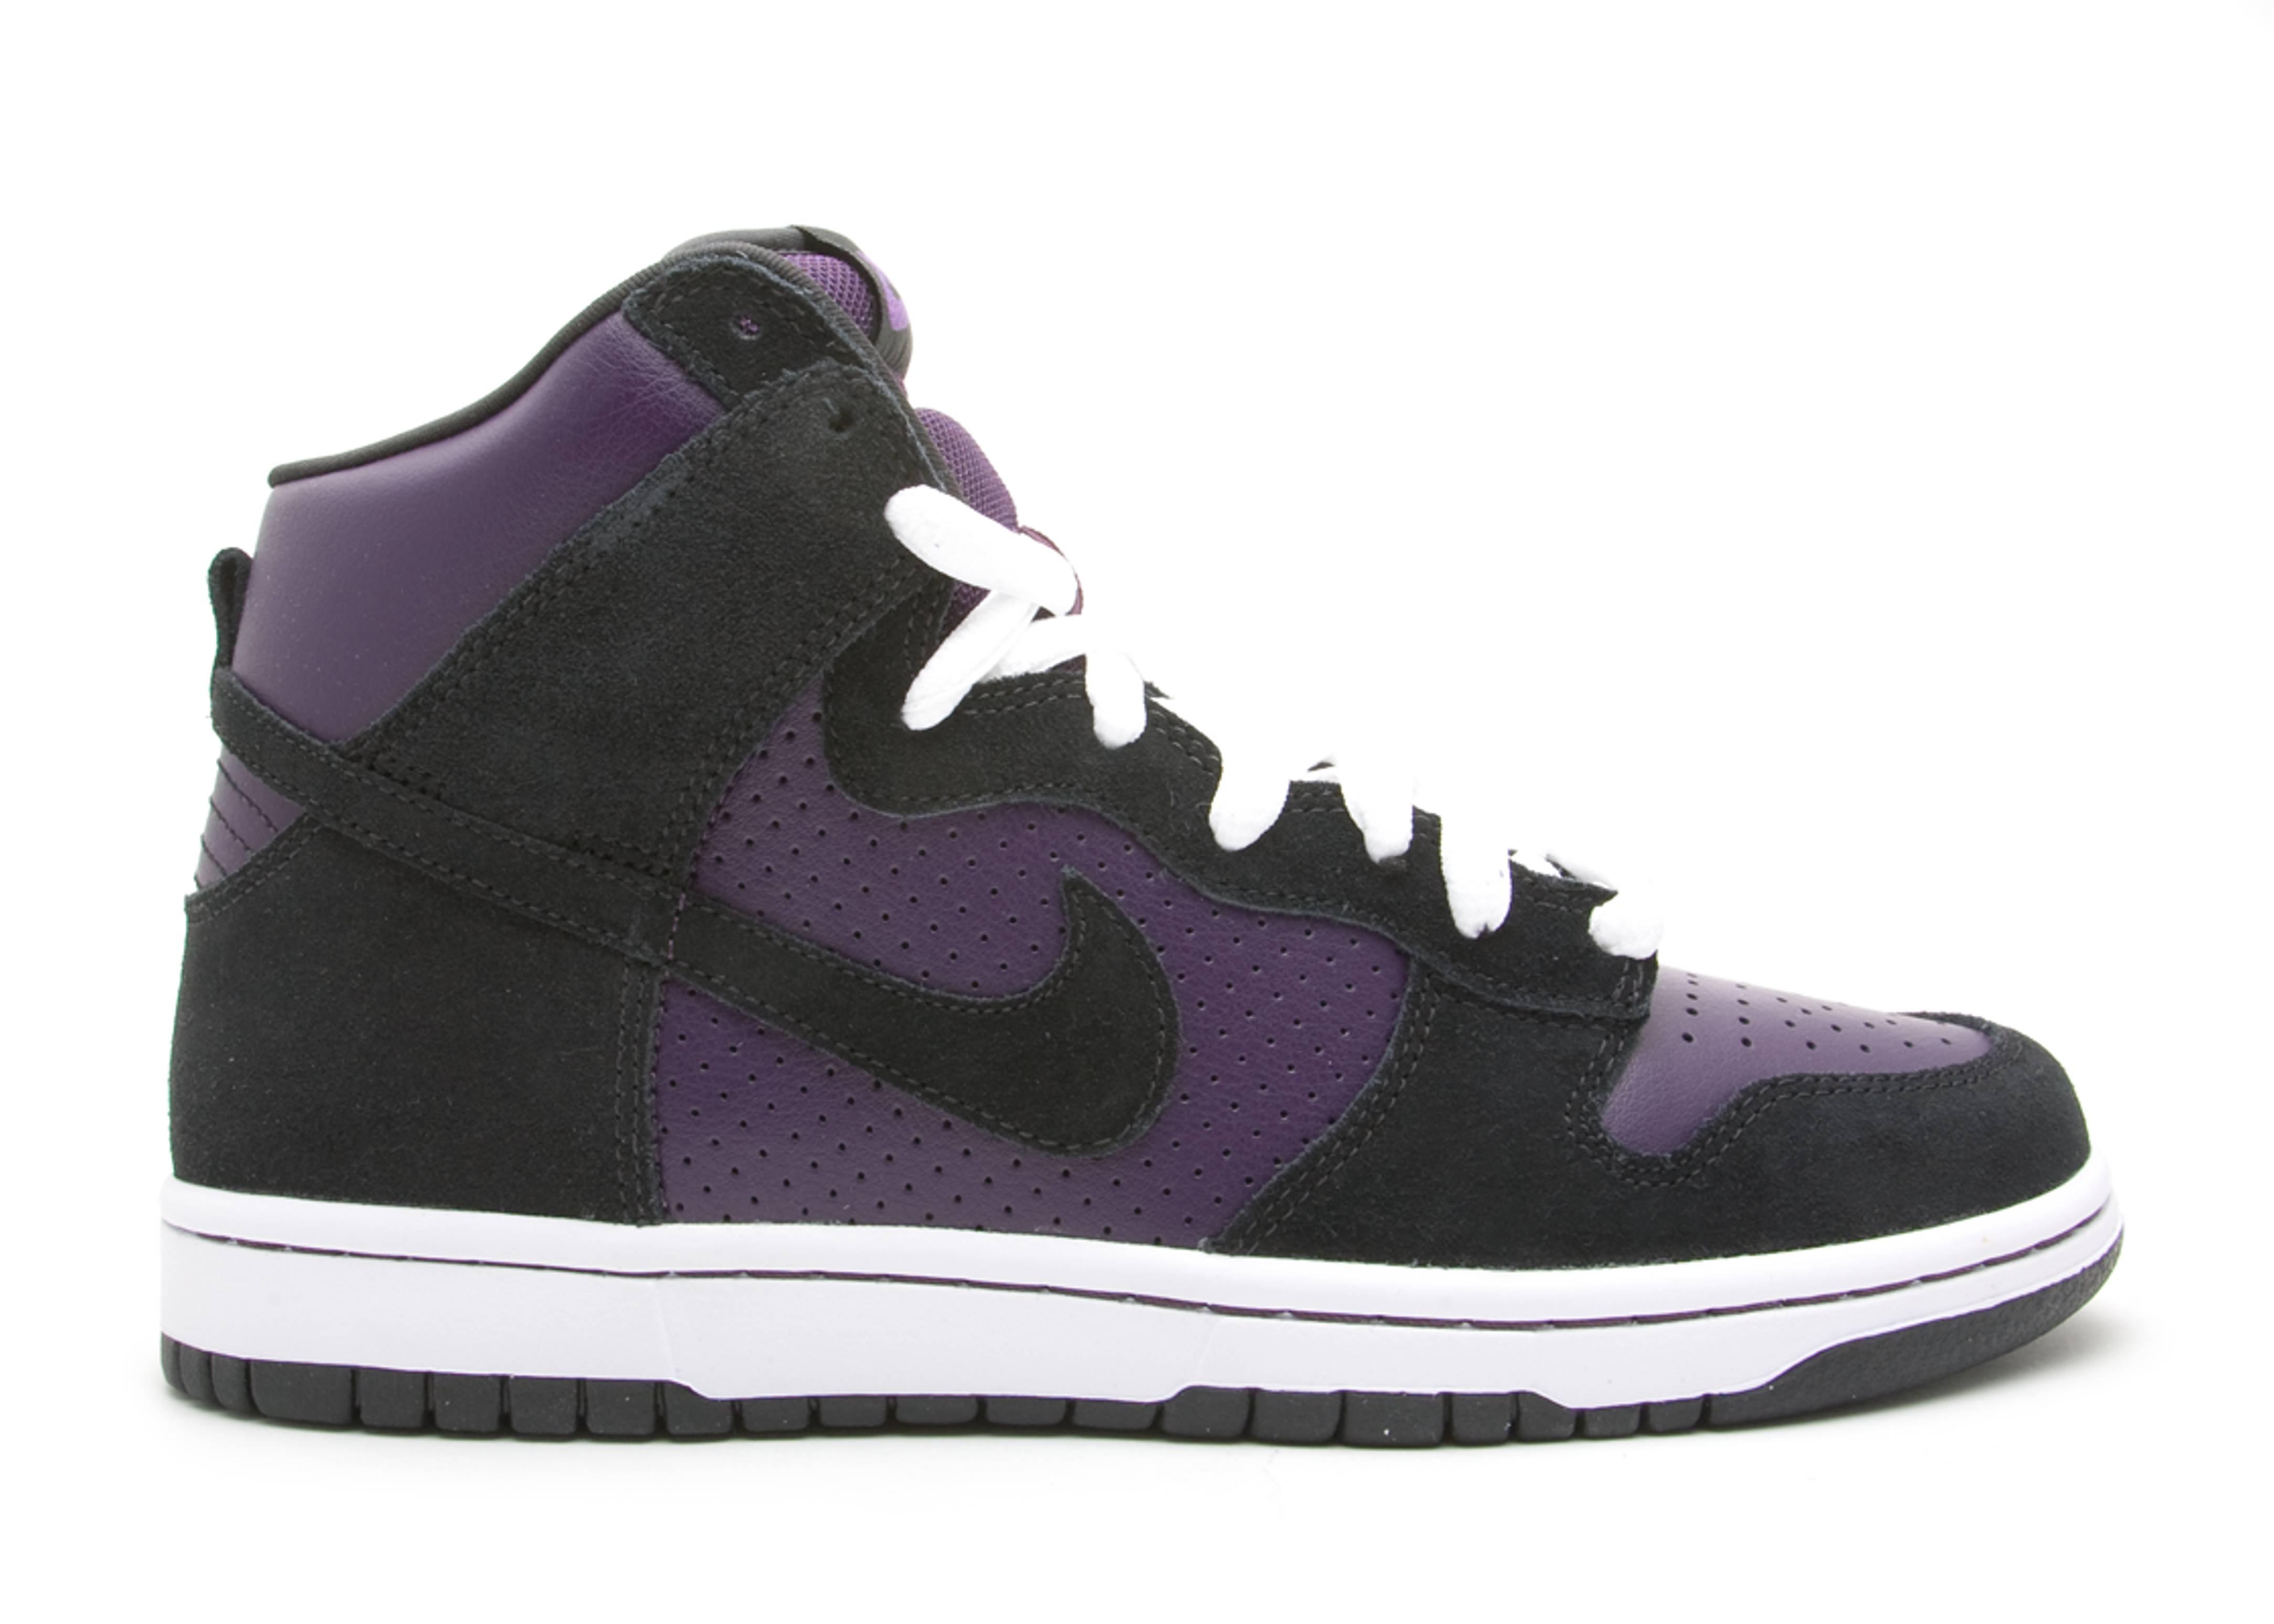 check out 168a8 22407 Dunk High Pro Sb - Nike - 305050 500 - grand purple black   Flight Club